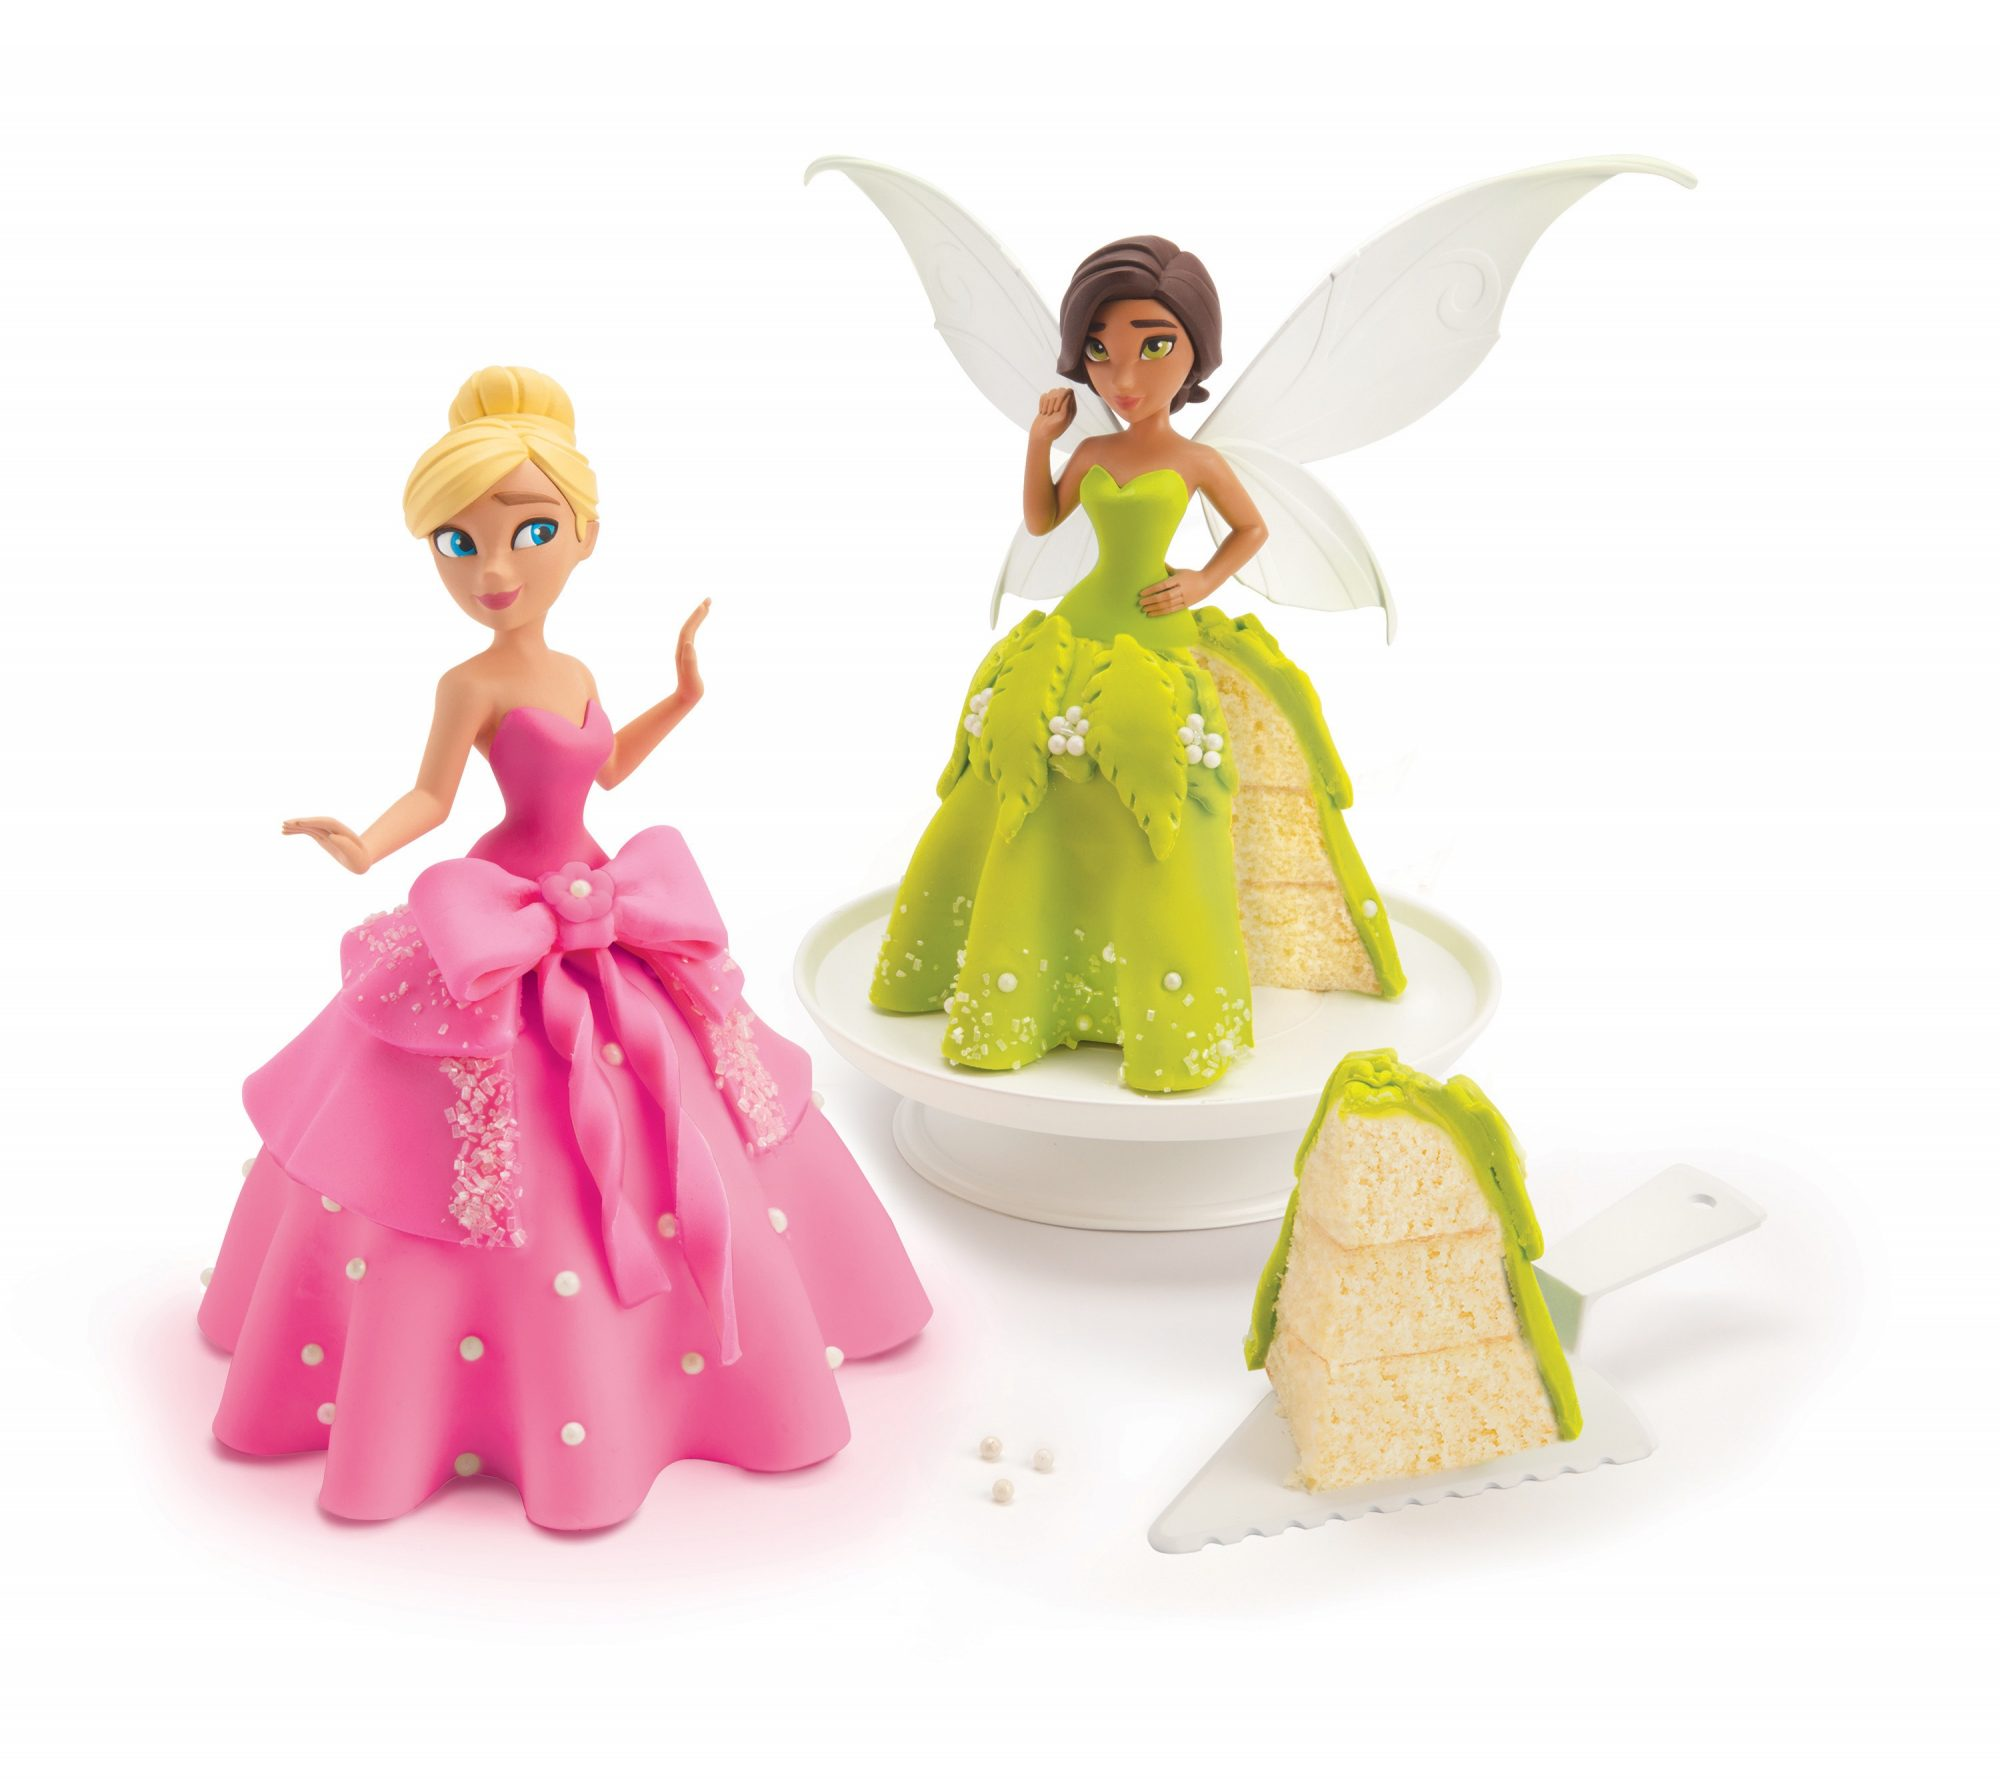 Princess and Fairy.jpeg